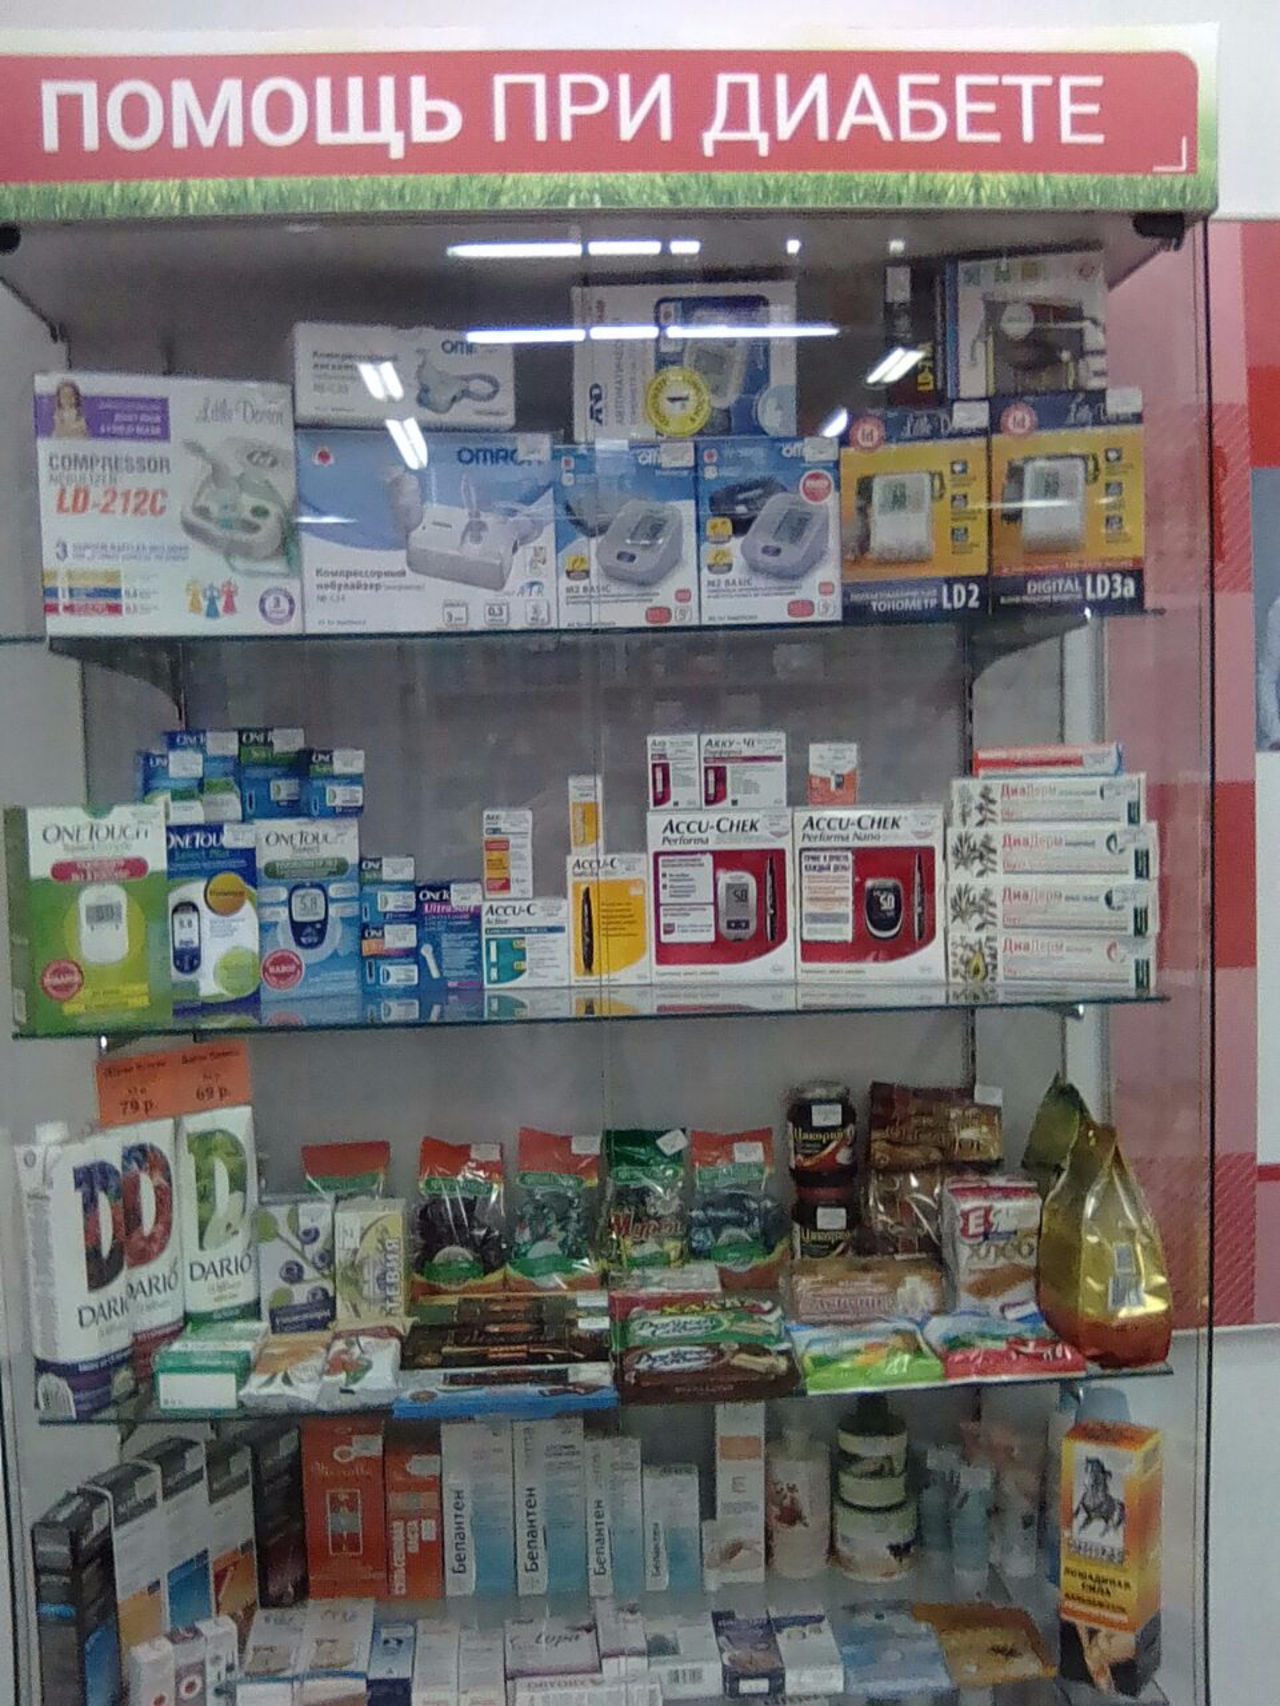 Аптеки для диабета в москве